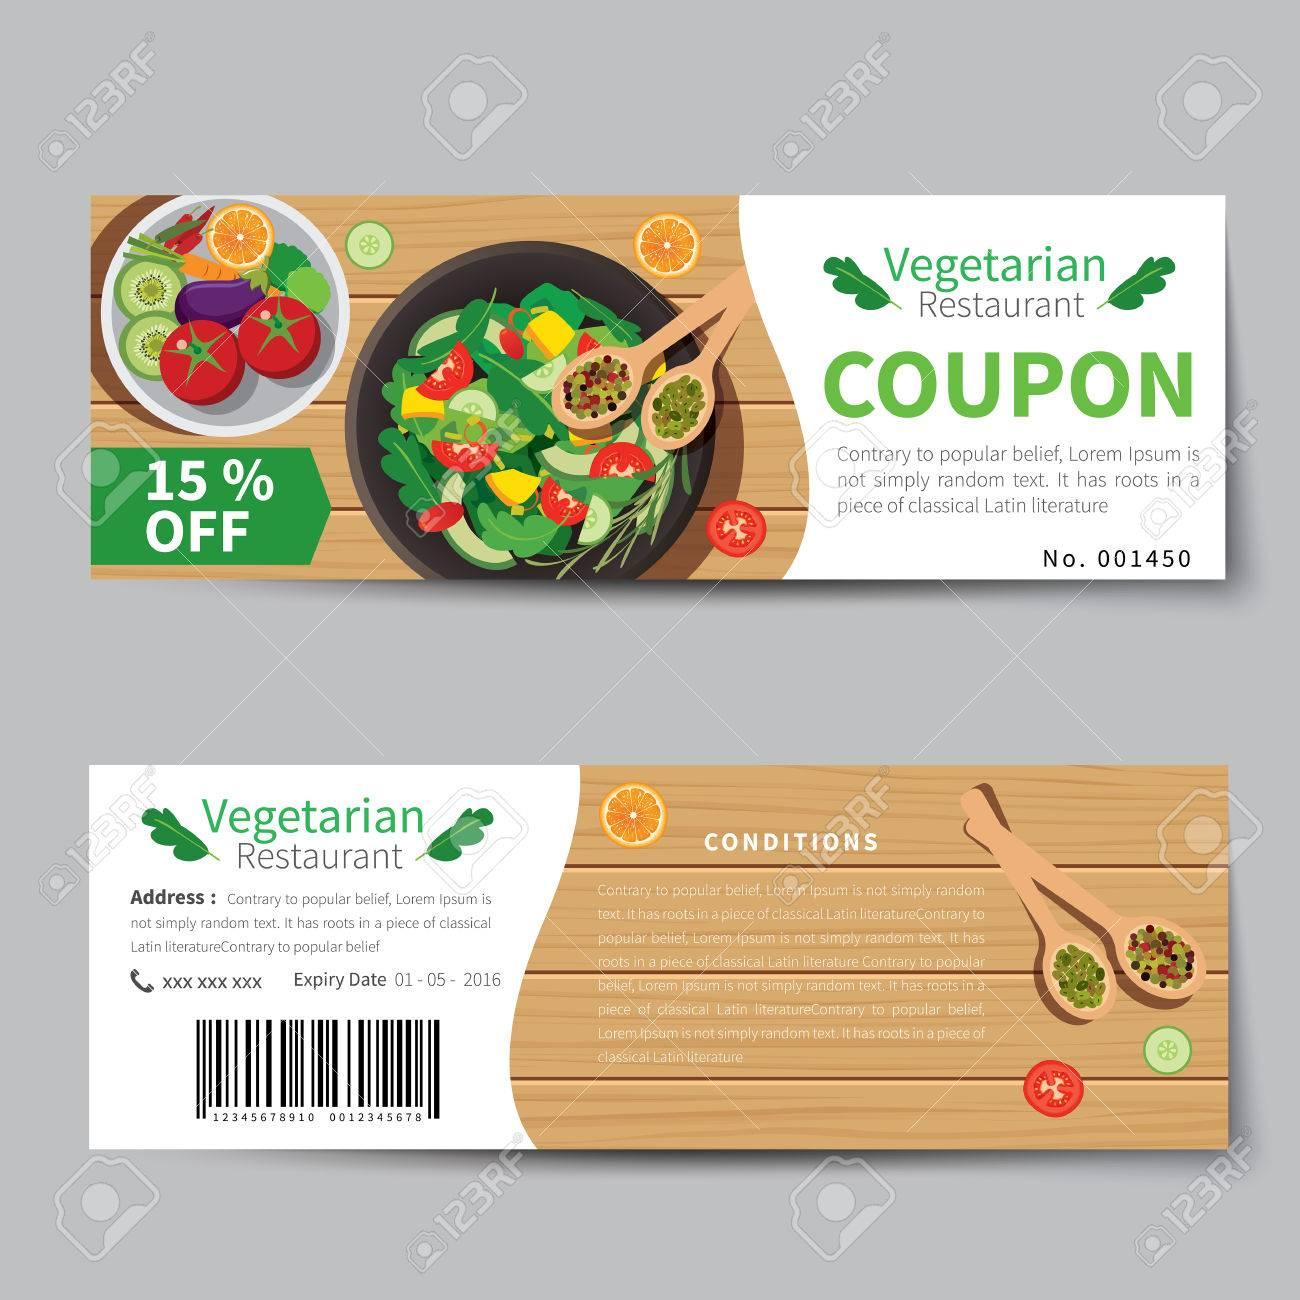 Vegetarian Food Coupon Discount Template Flat Design Royalty Free ...